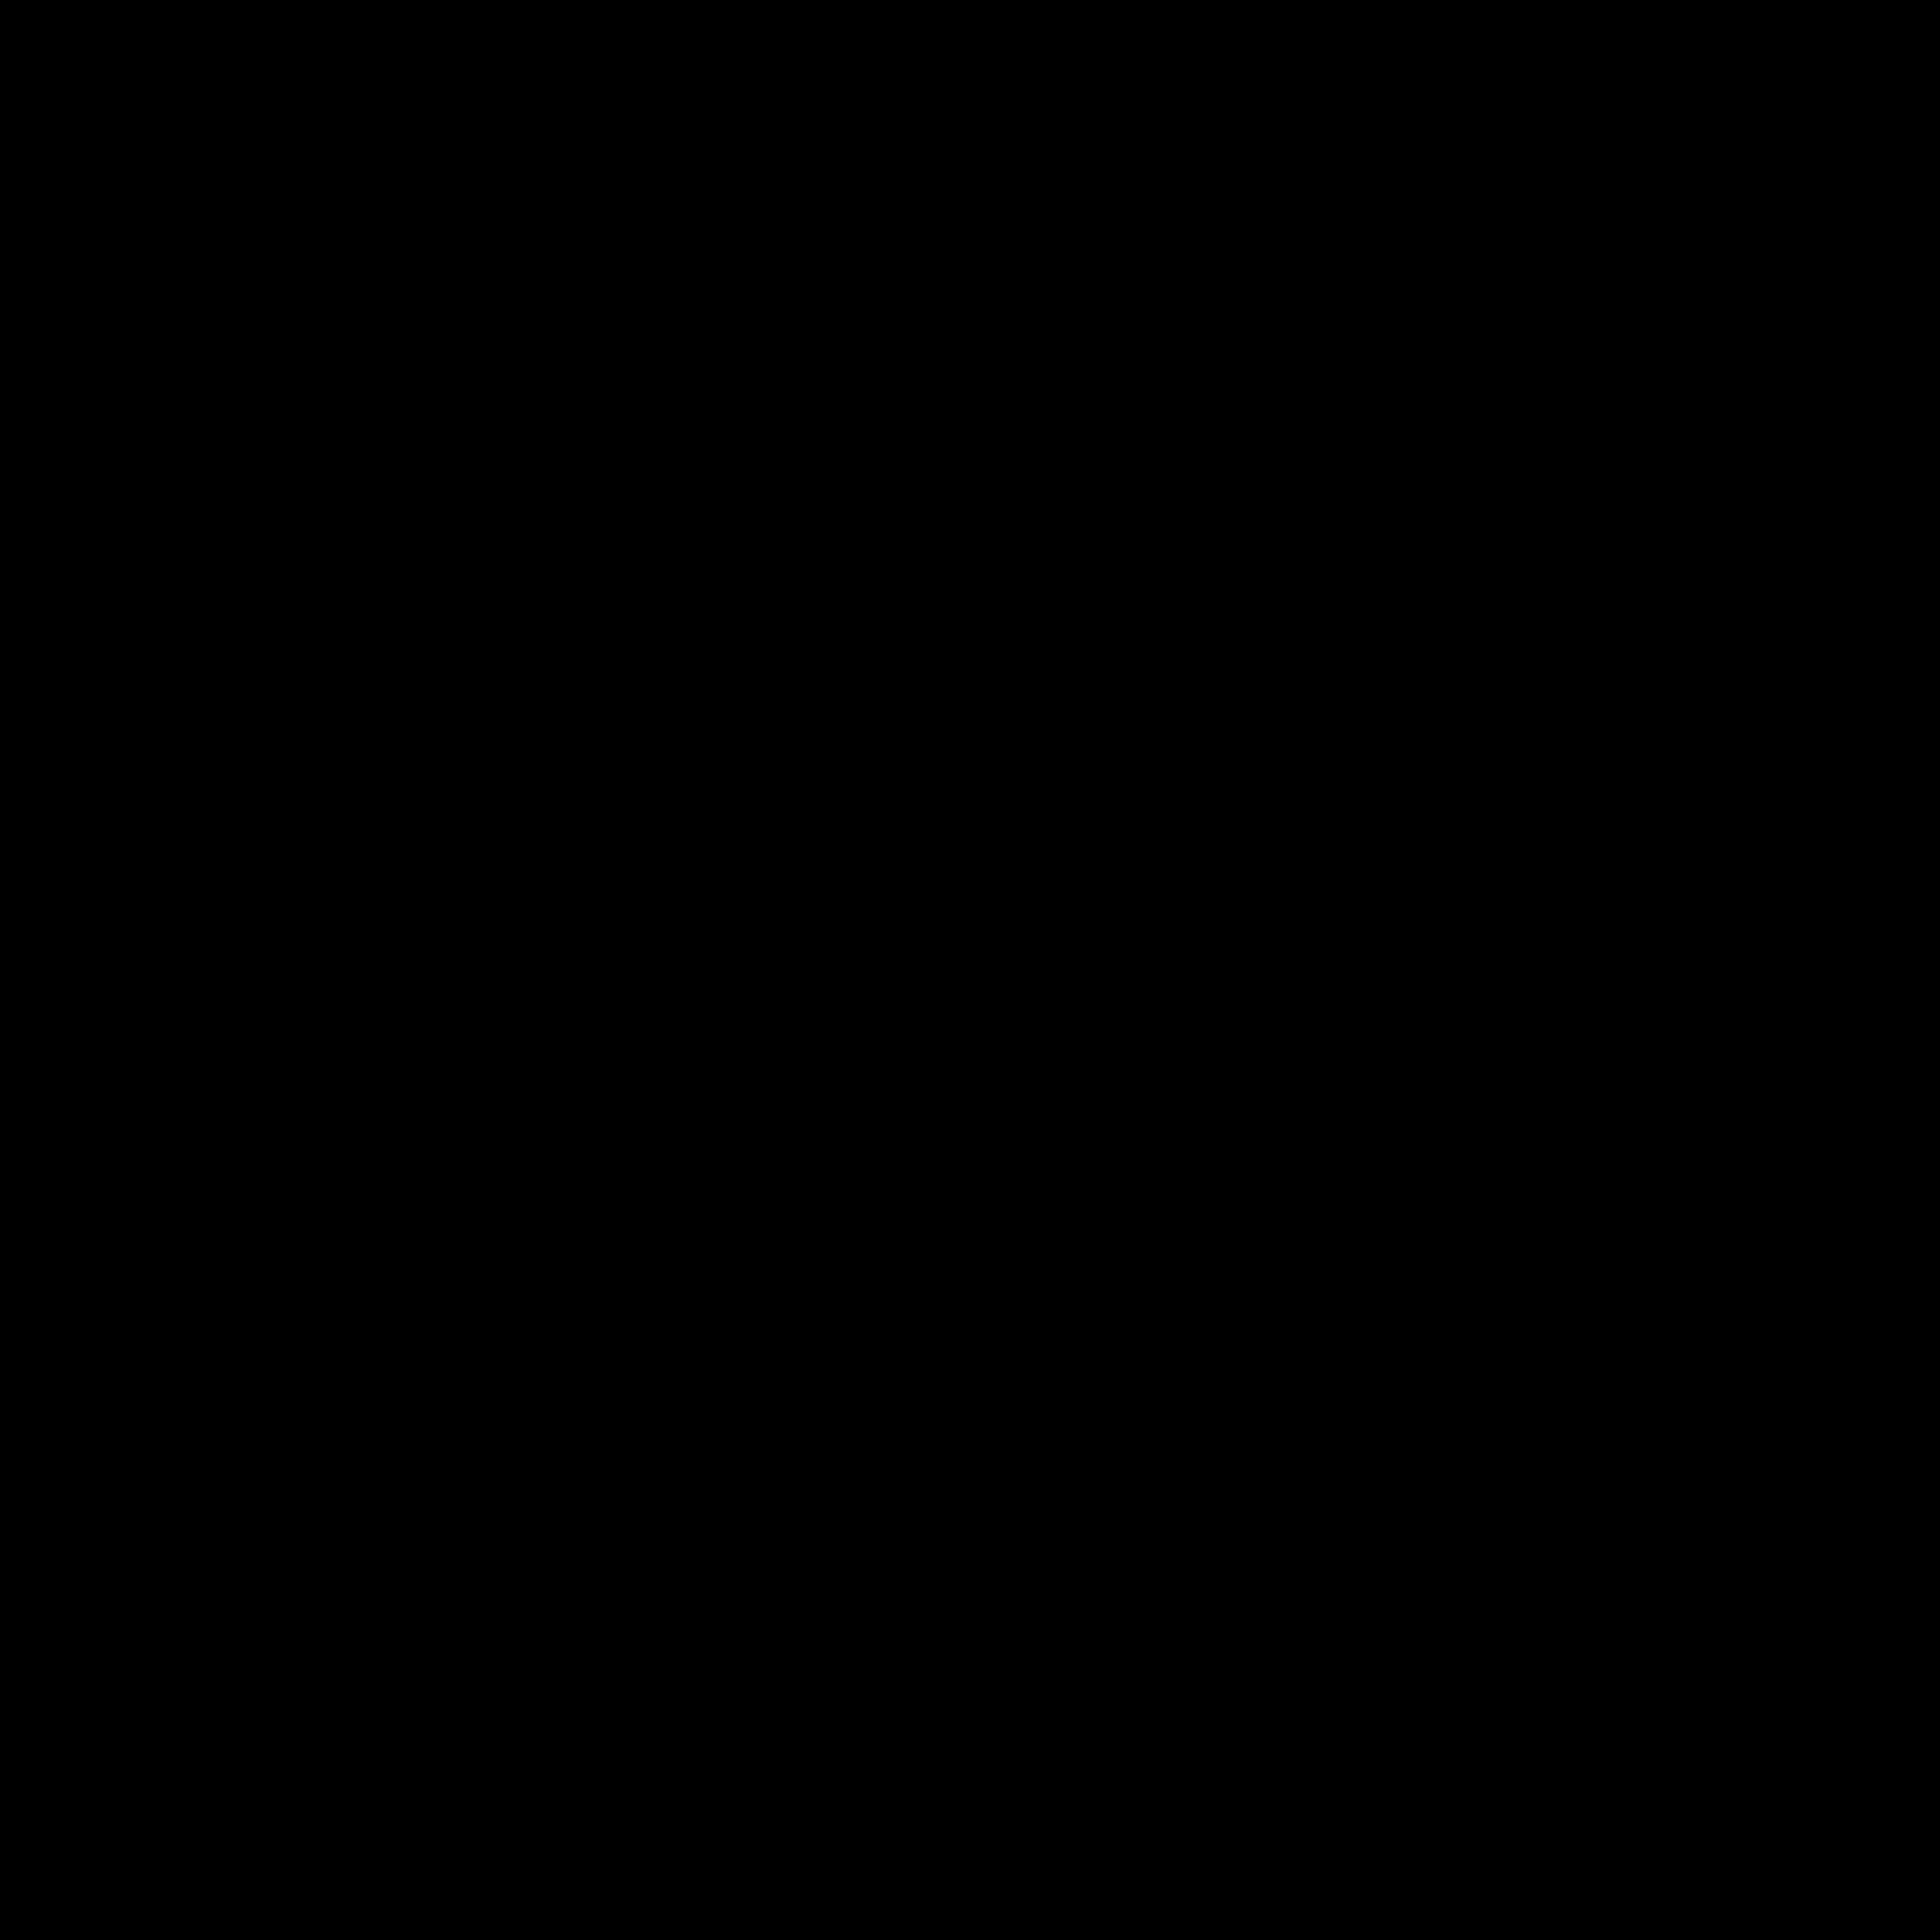 Black and White Buffalo Plaid Rope Leine, Standard